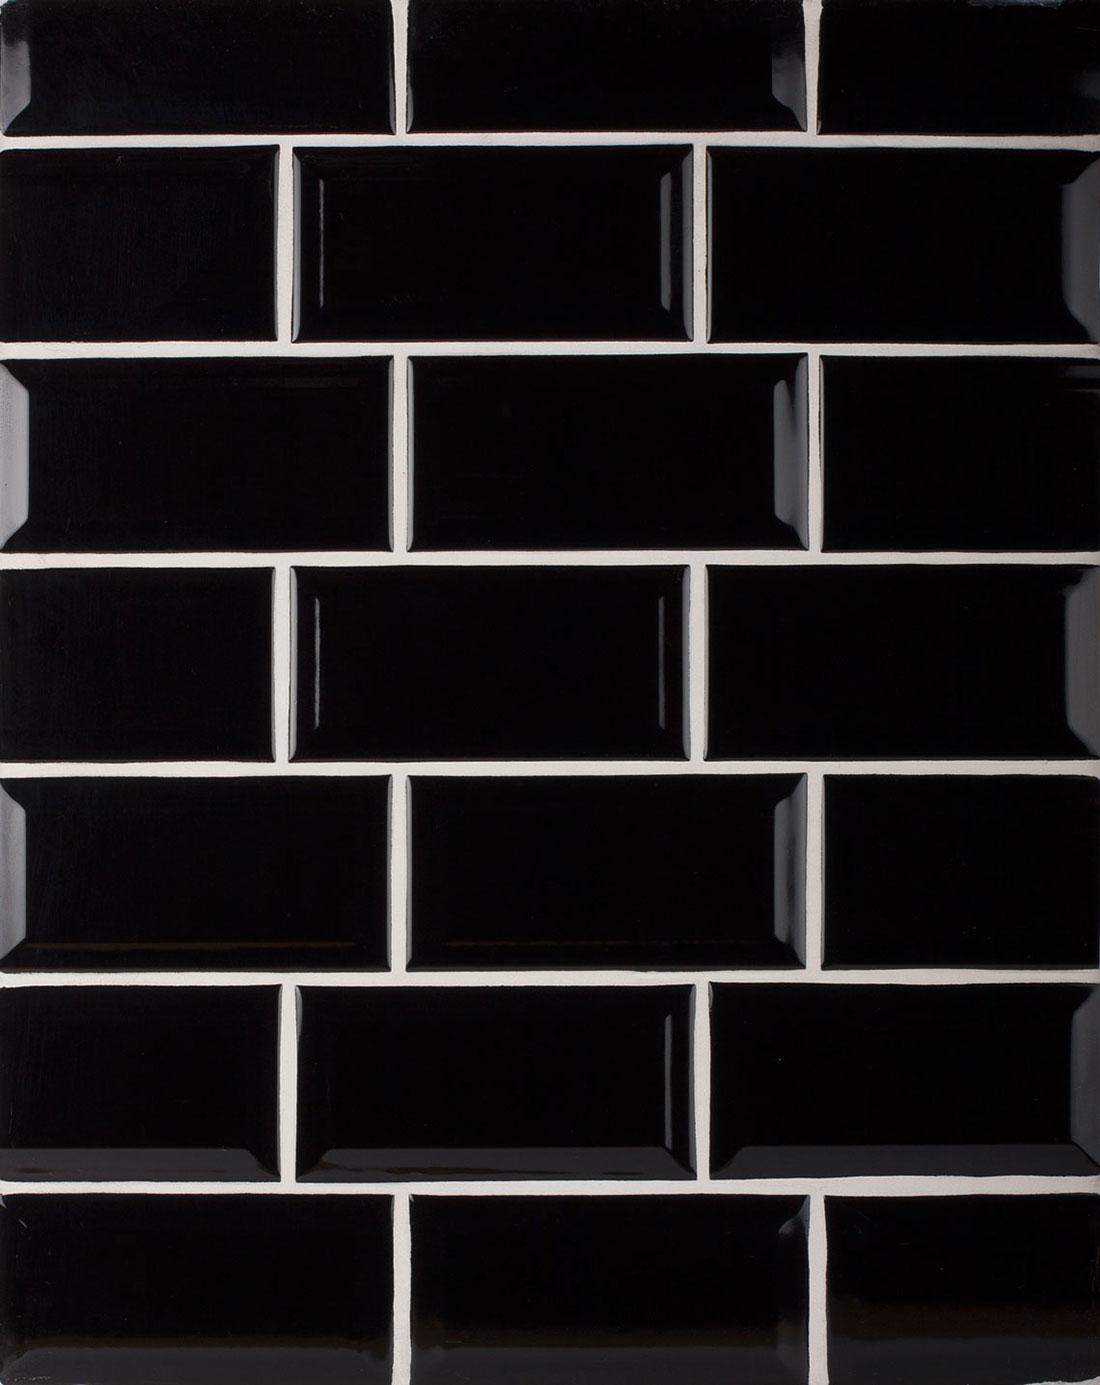 Kitchen Tiles Samples negro biselado kitchen tiles @ £24.64 m2! free tile samples